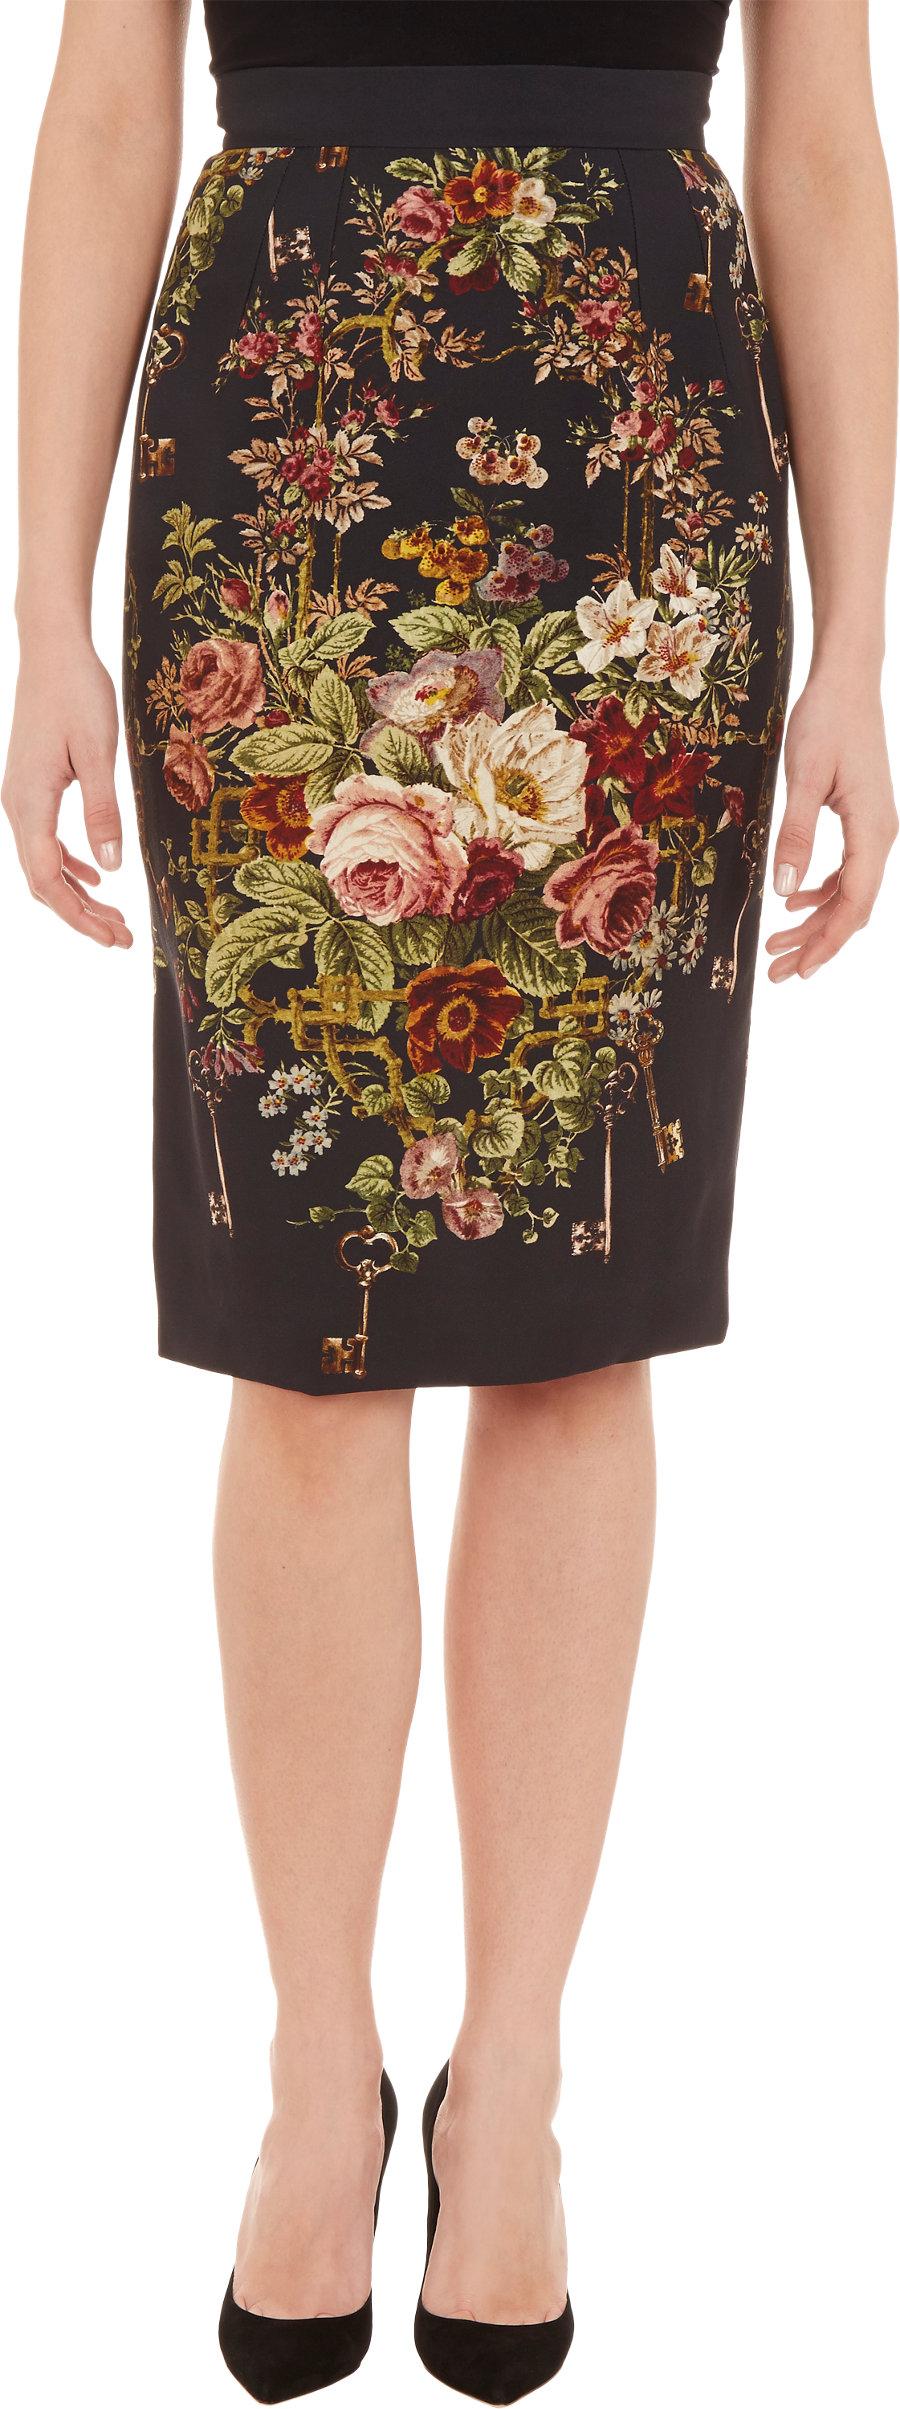 floral pencil skirt - photo #35